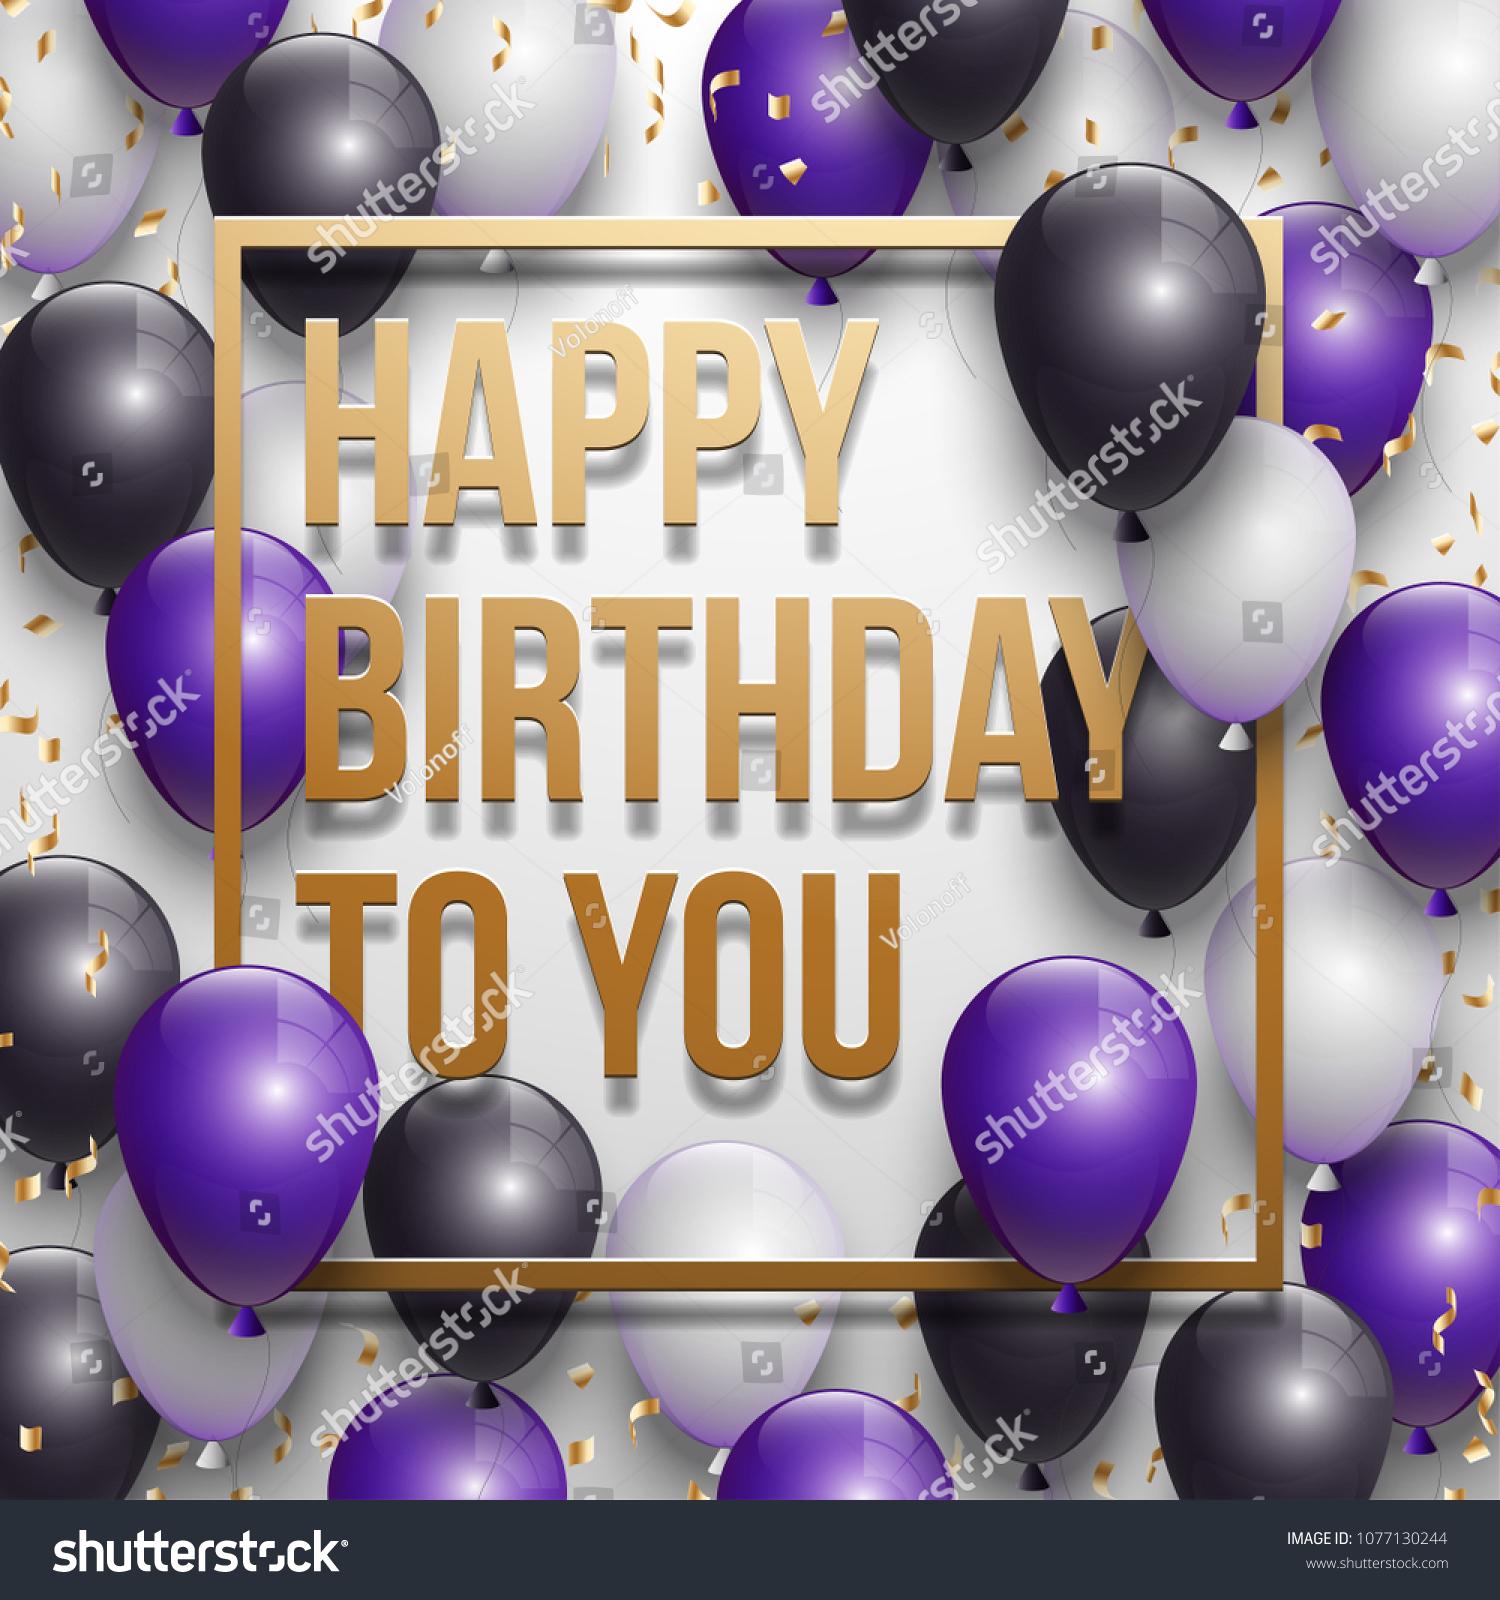 Happy Birthday Vector Illustration Golden Foil Stock Vector Royalty Free 1077130244